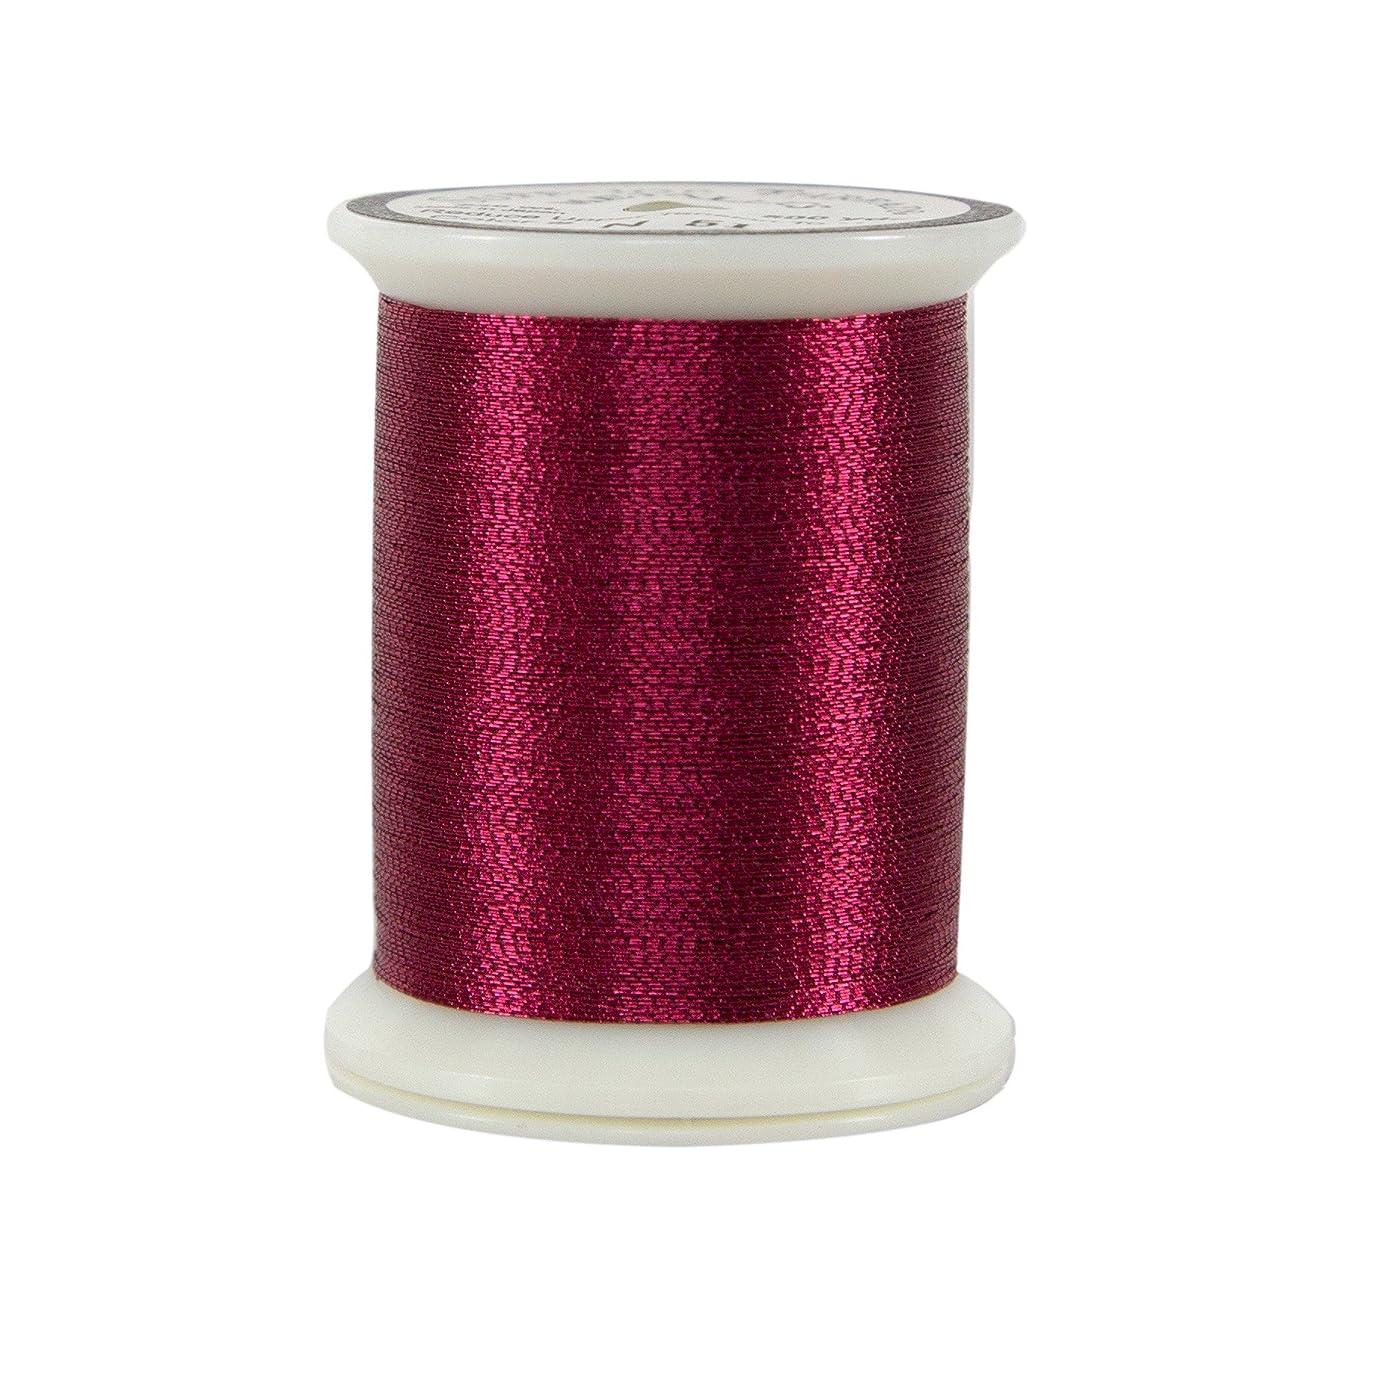 Superior Threads 10101-N51 Cranberry Metallic Thread, 500 yd